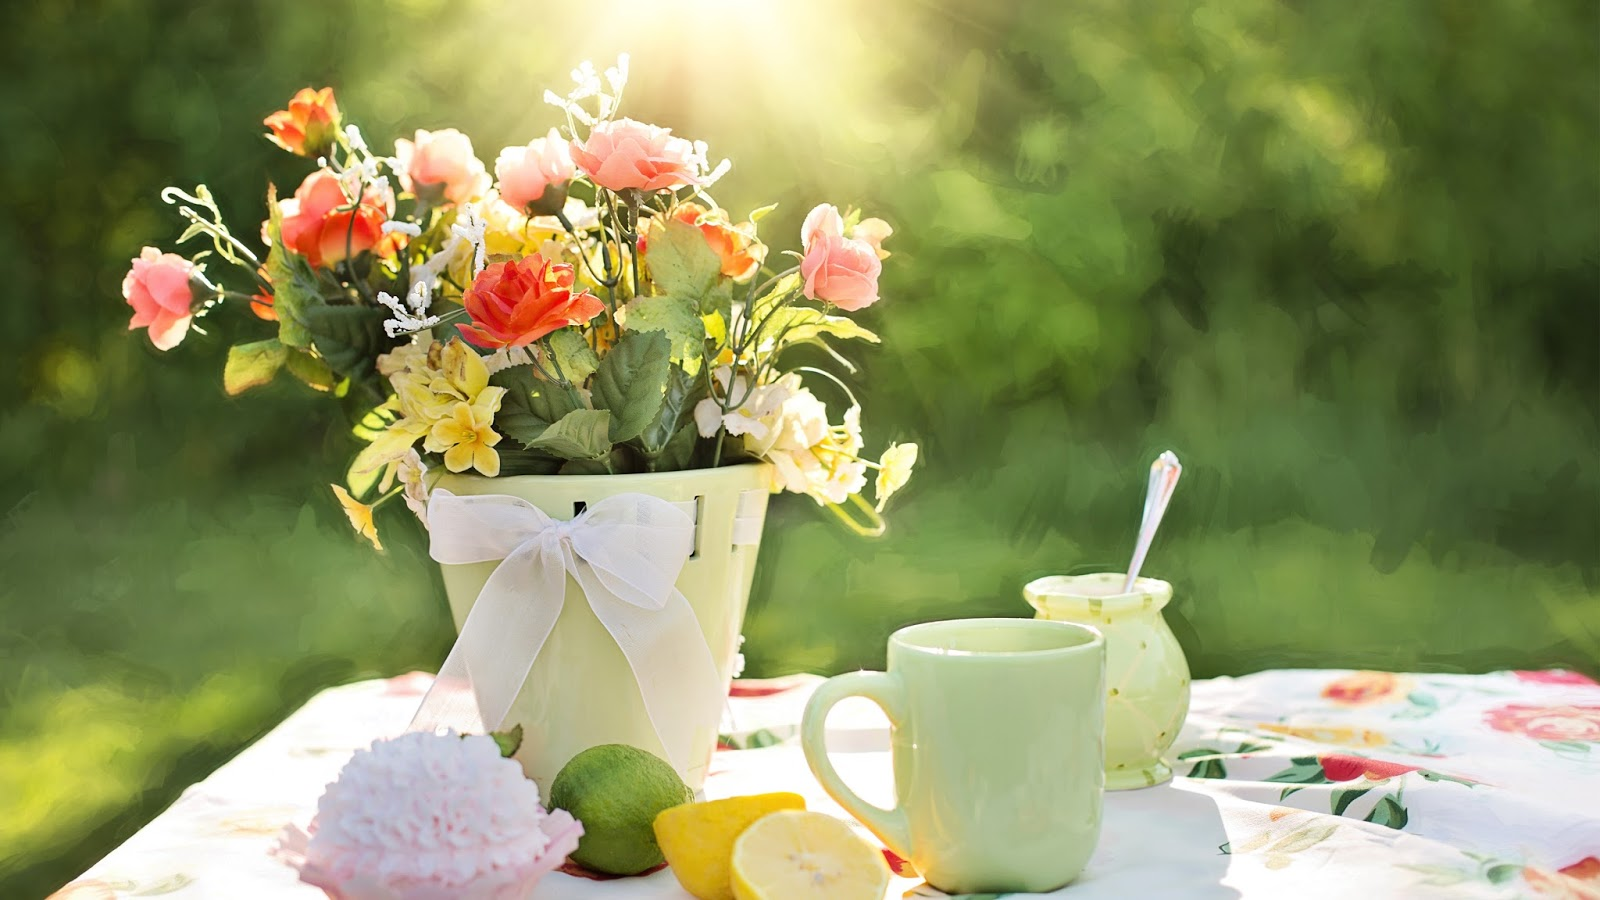 Summer Beautiful Flowers HD Wallpaper